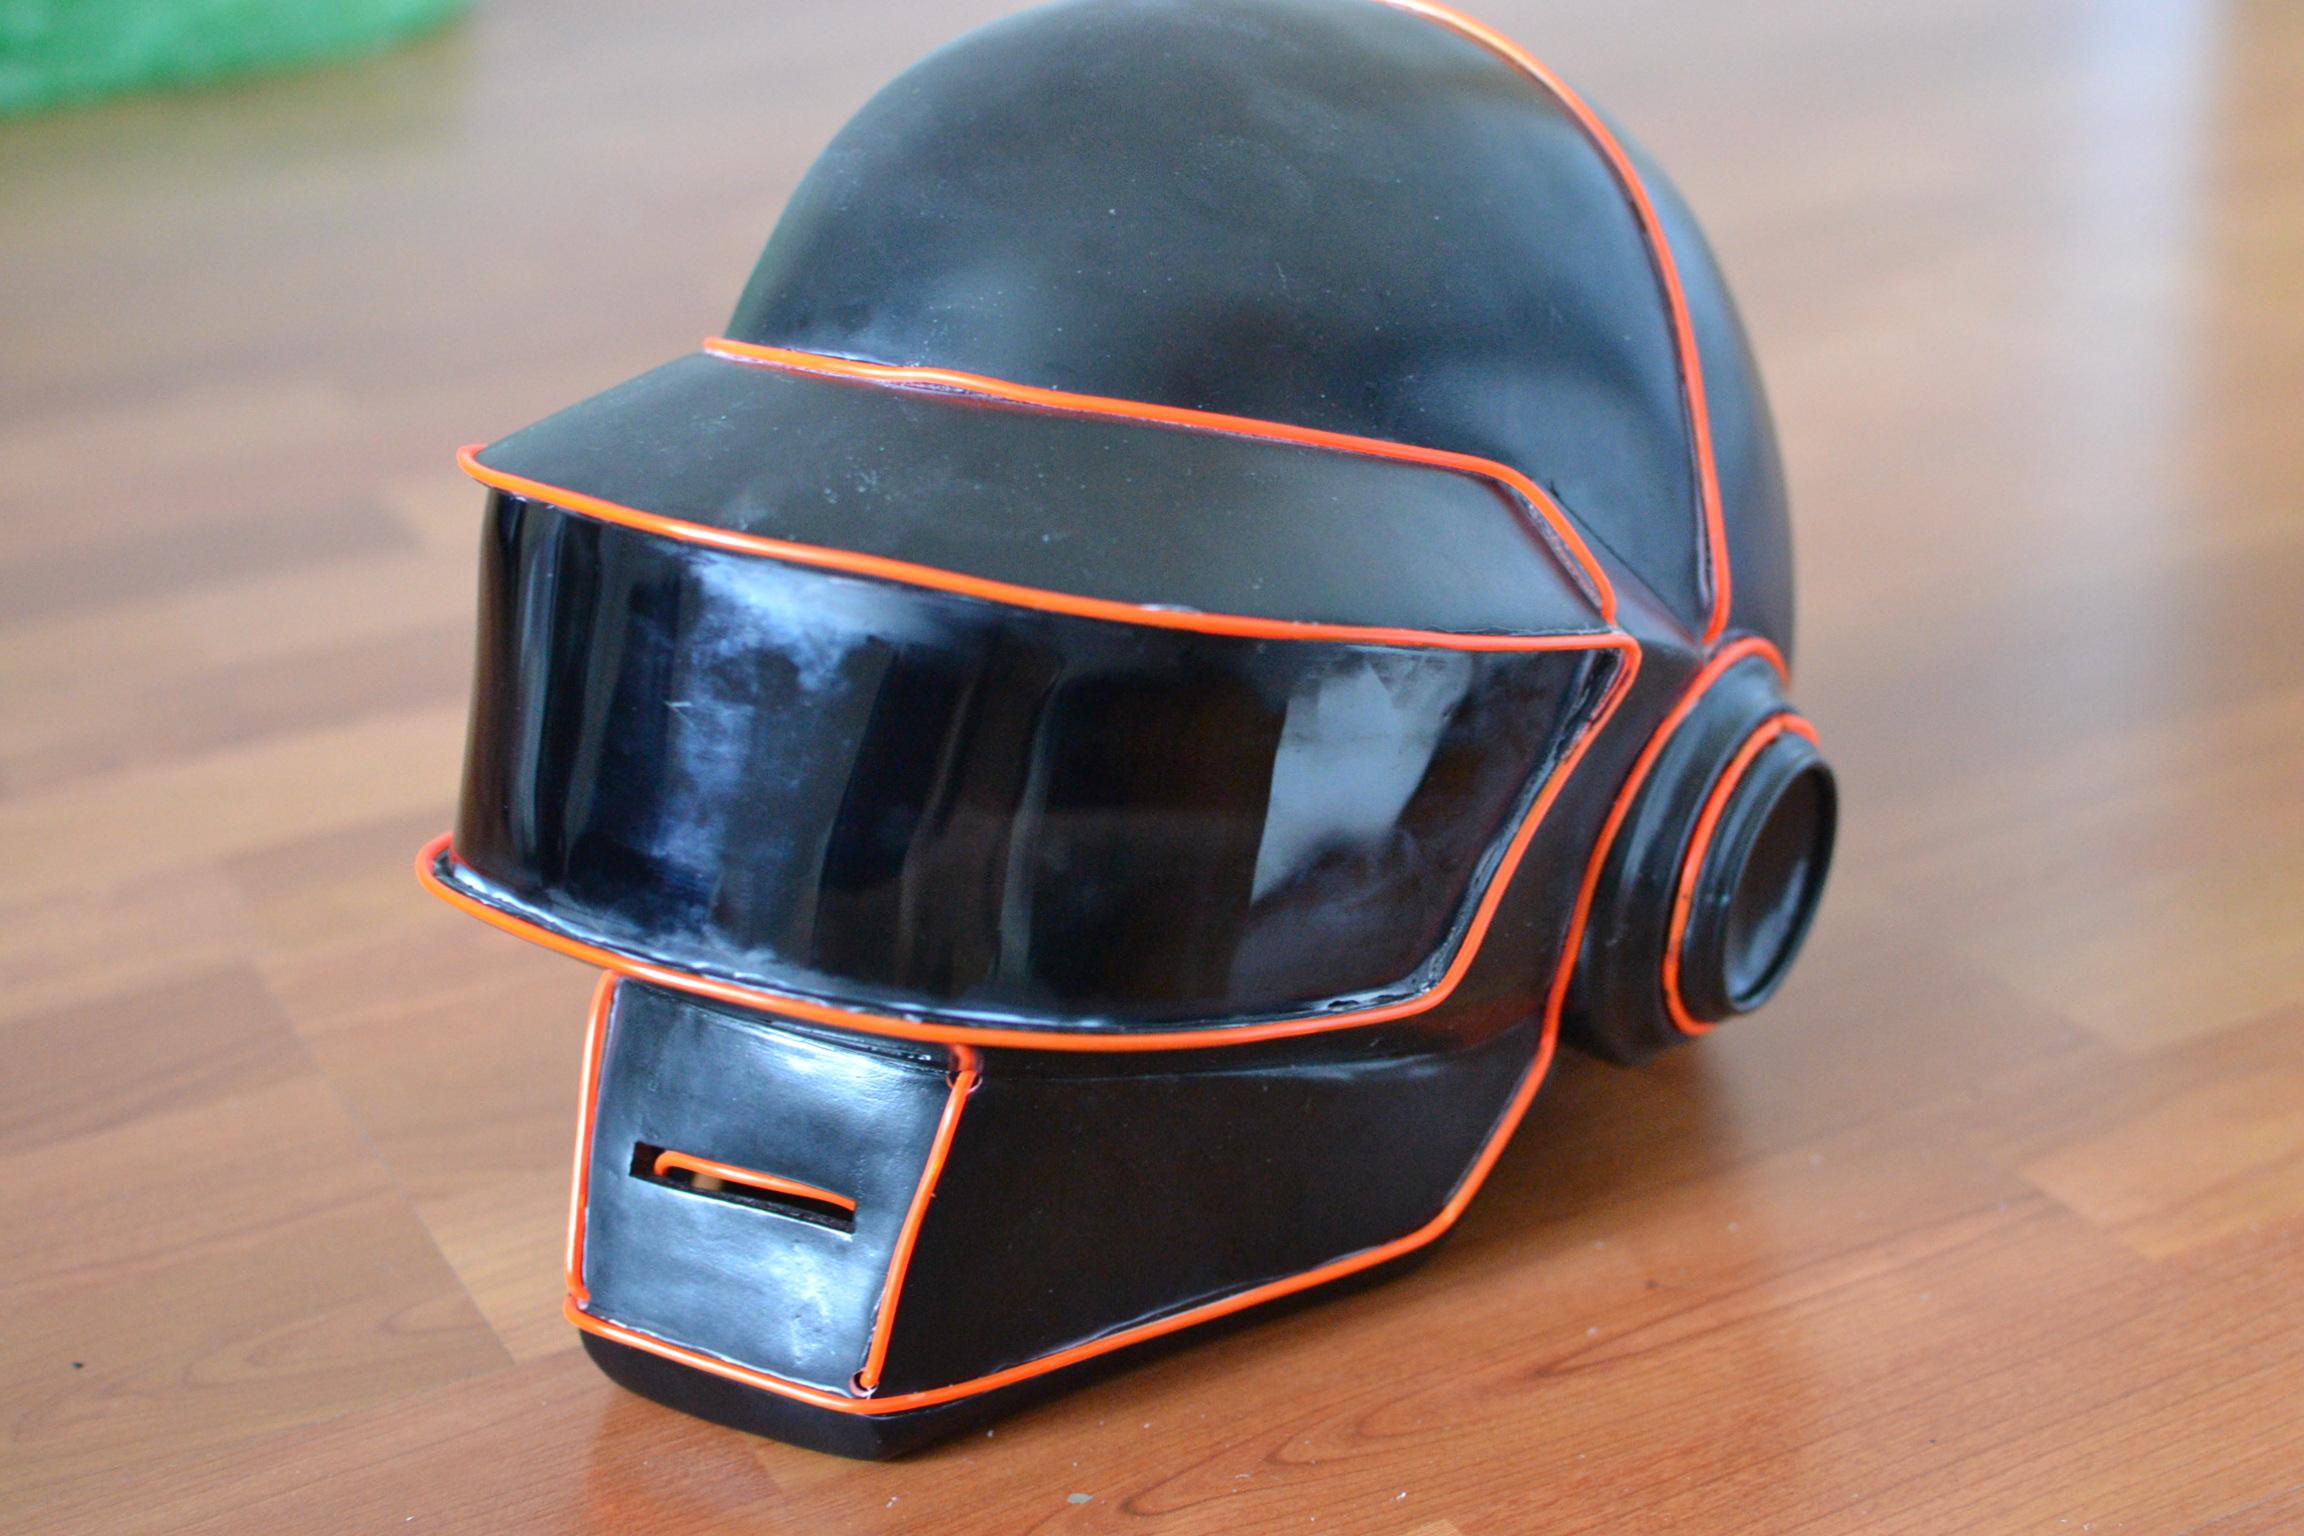 Daft Punk Thomas Bangalter Helmet!